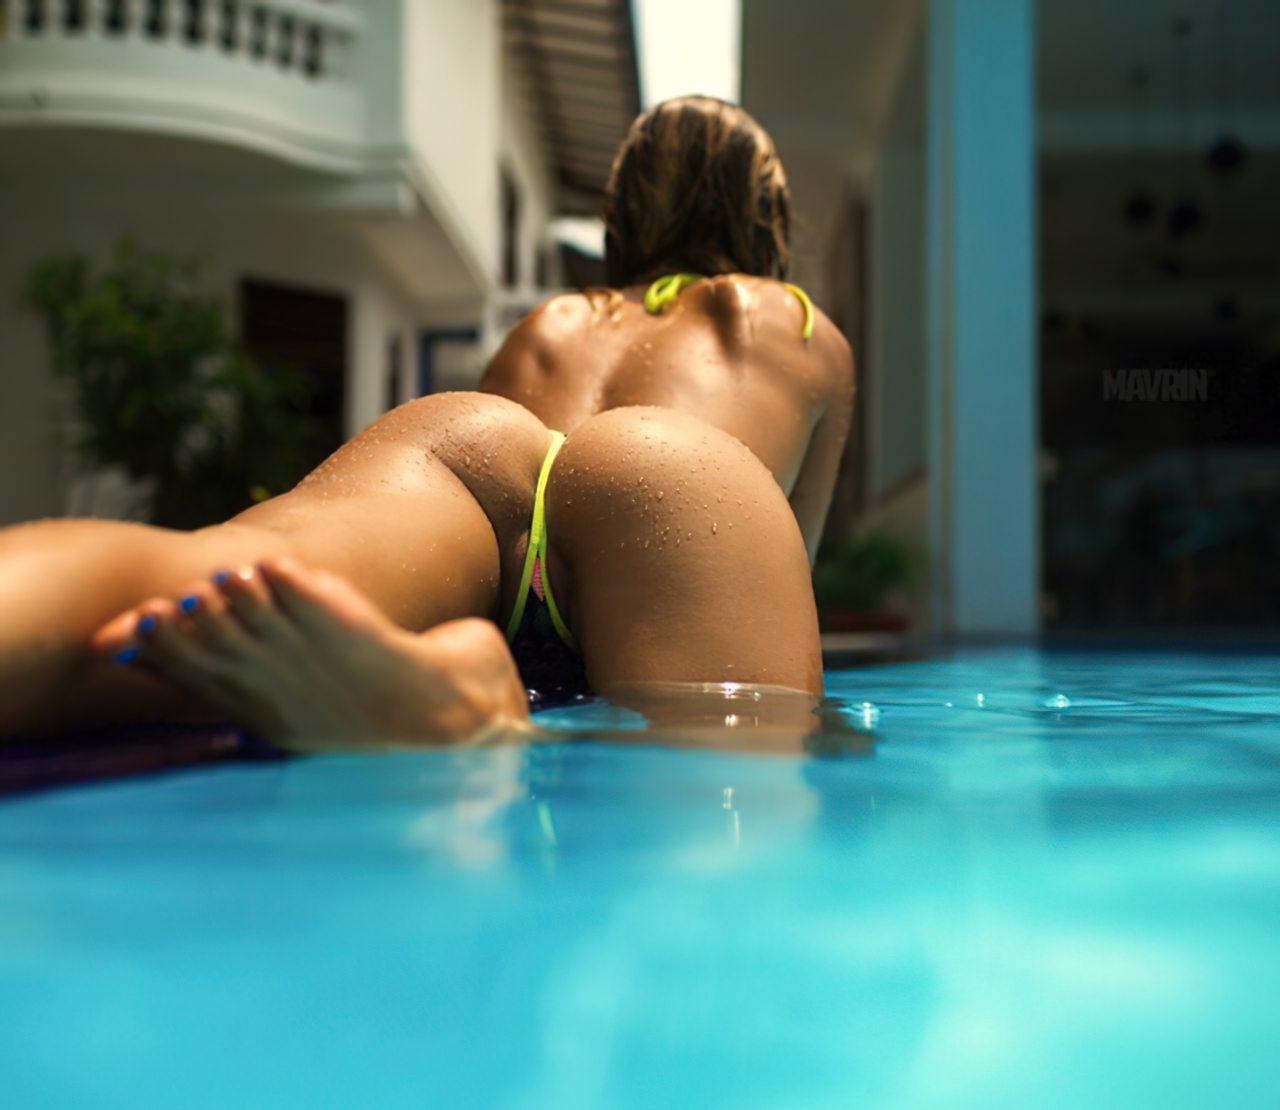 Mulher Nua (33)